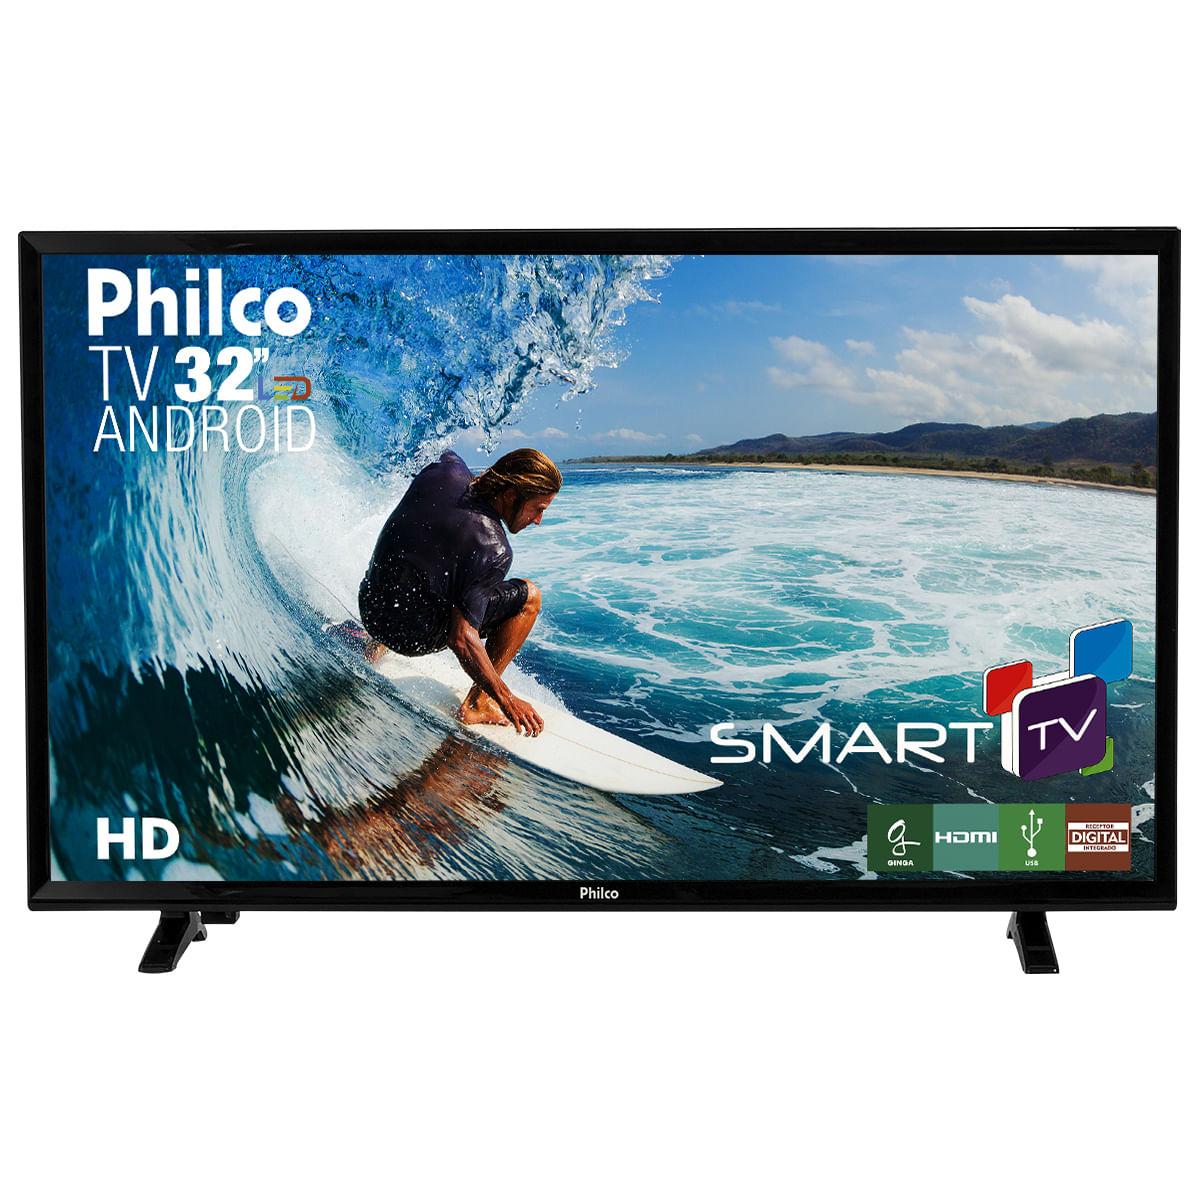 "3450c4751faf4b TV Philco 32"" PH32E20DSGWA Android   Philco - Philco Club"